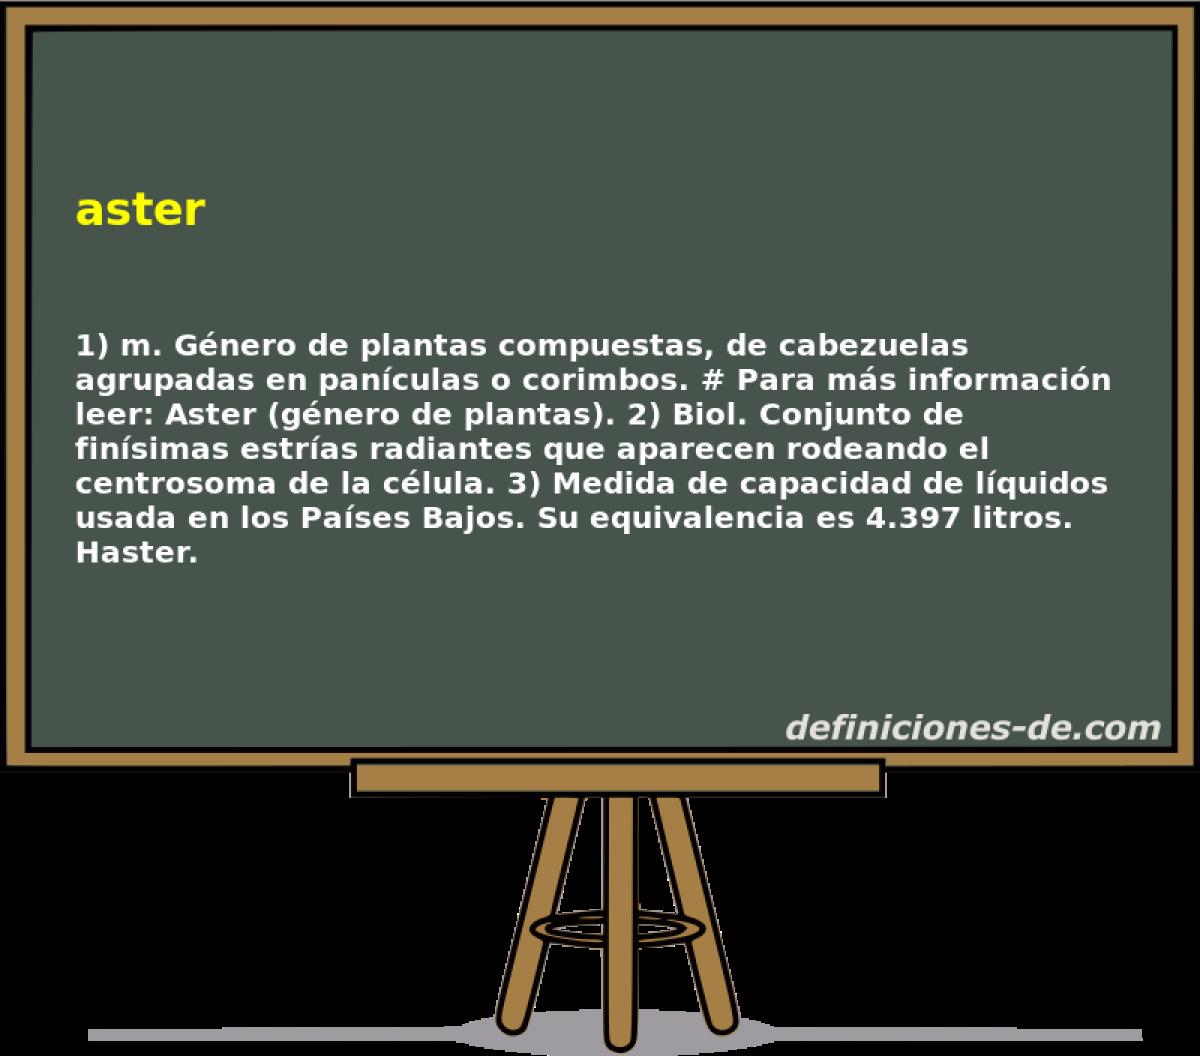 Qué significa Aster?